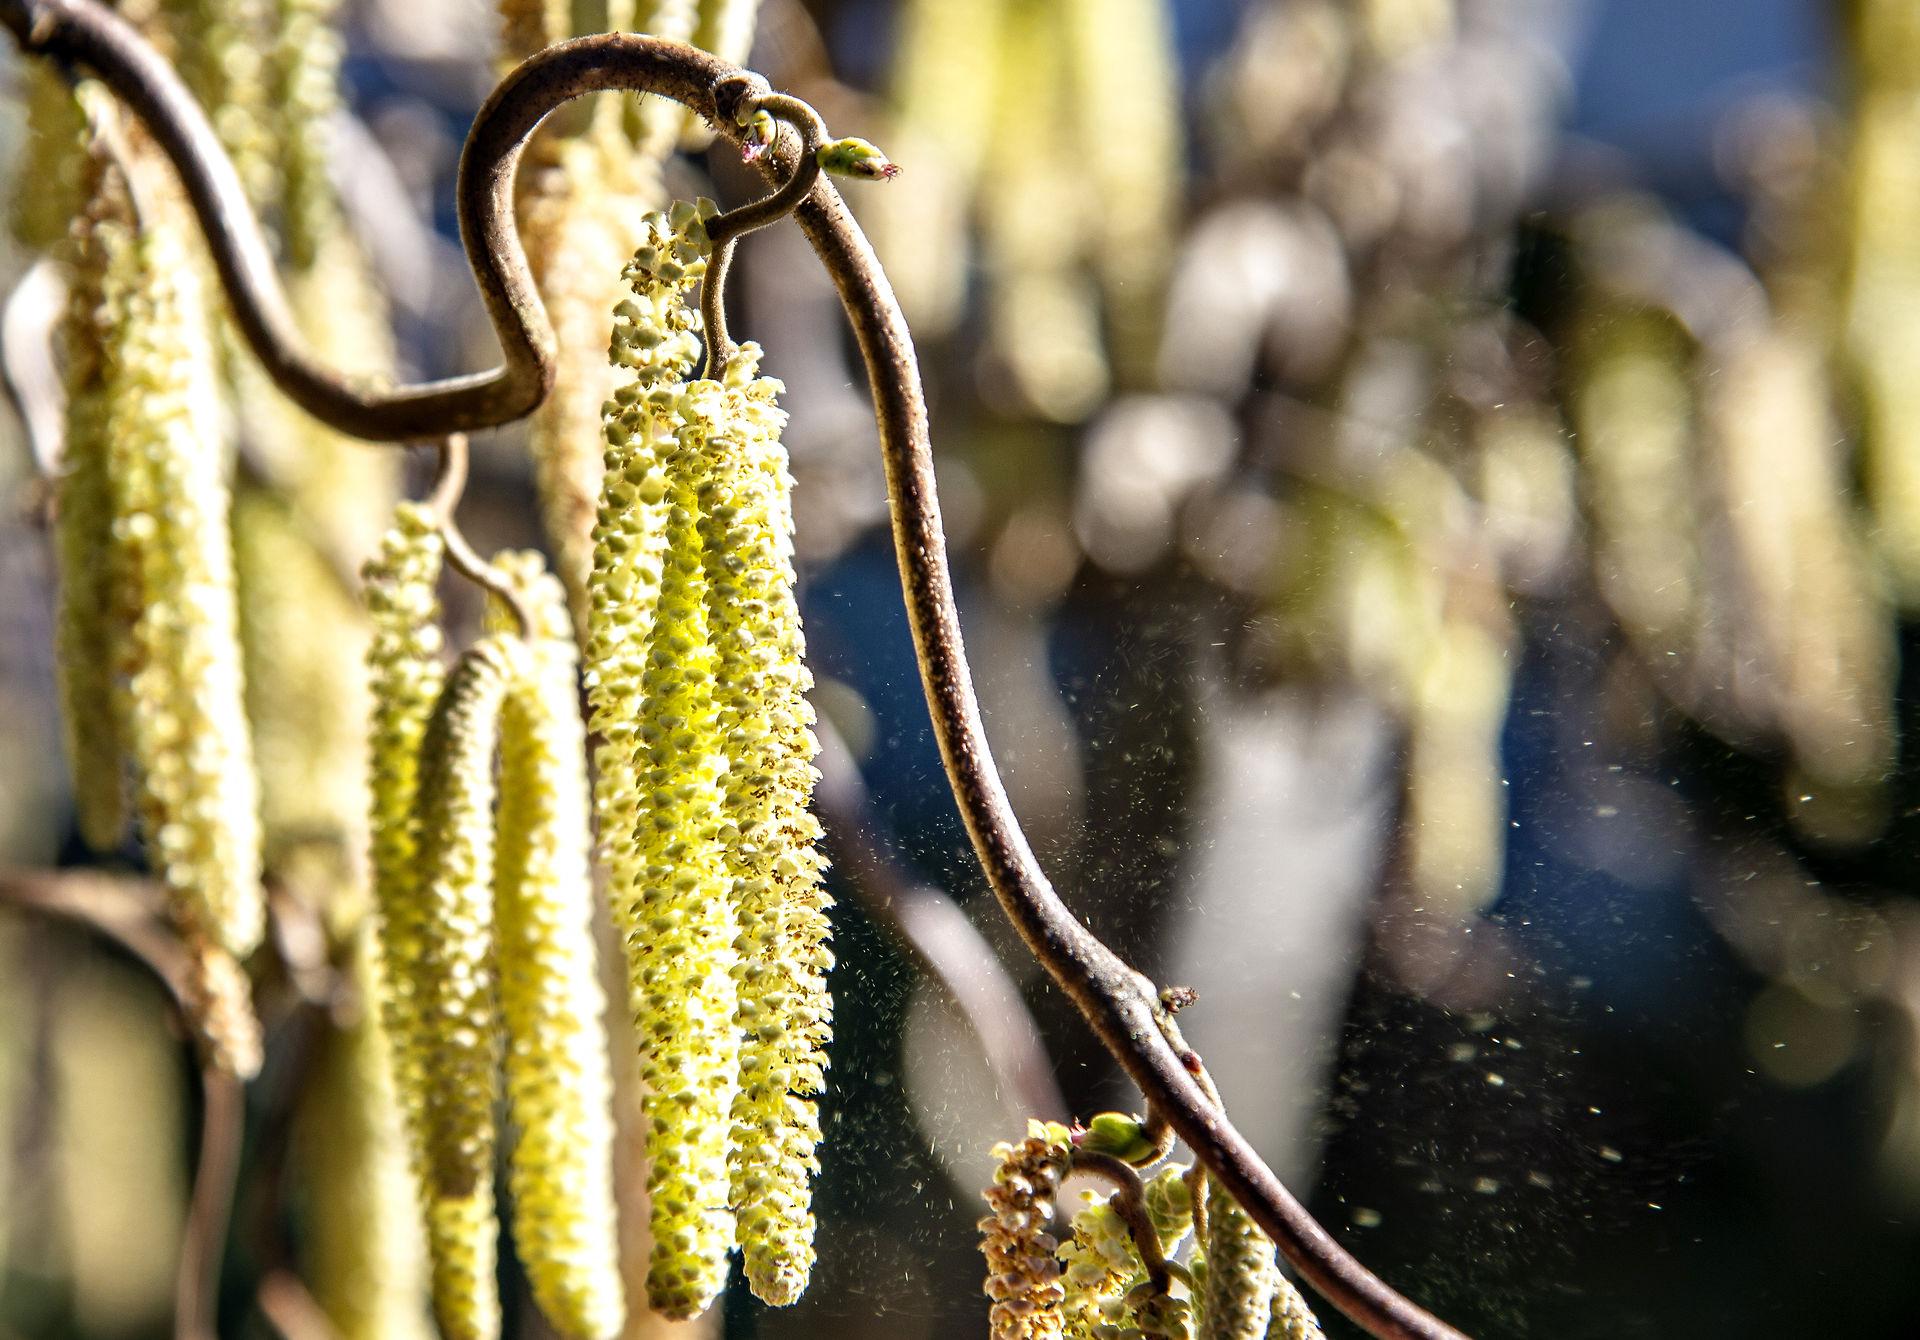 pollen_hassel_henning_bagger.jpg